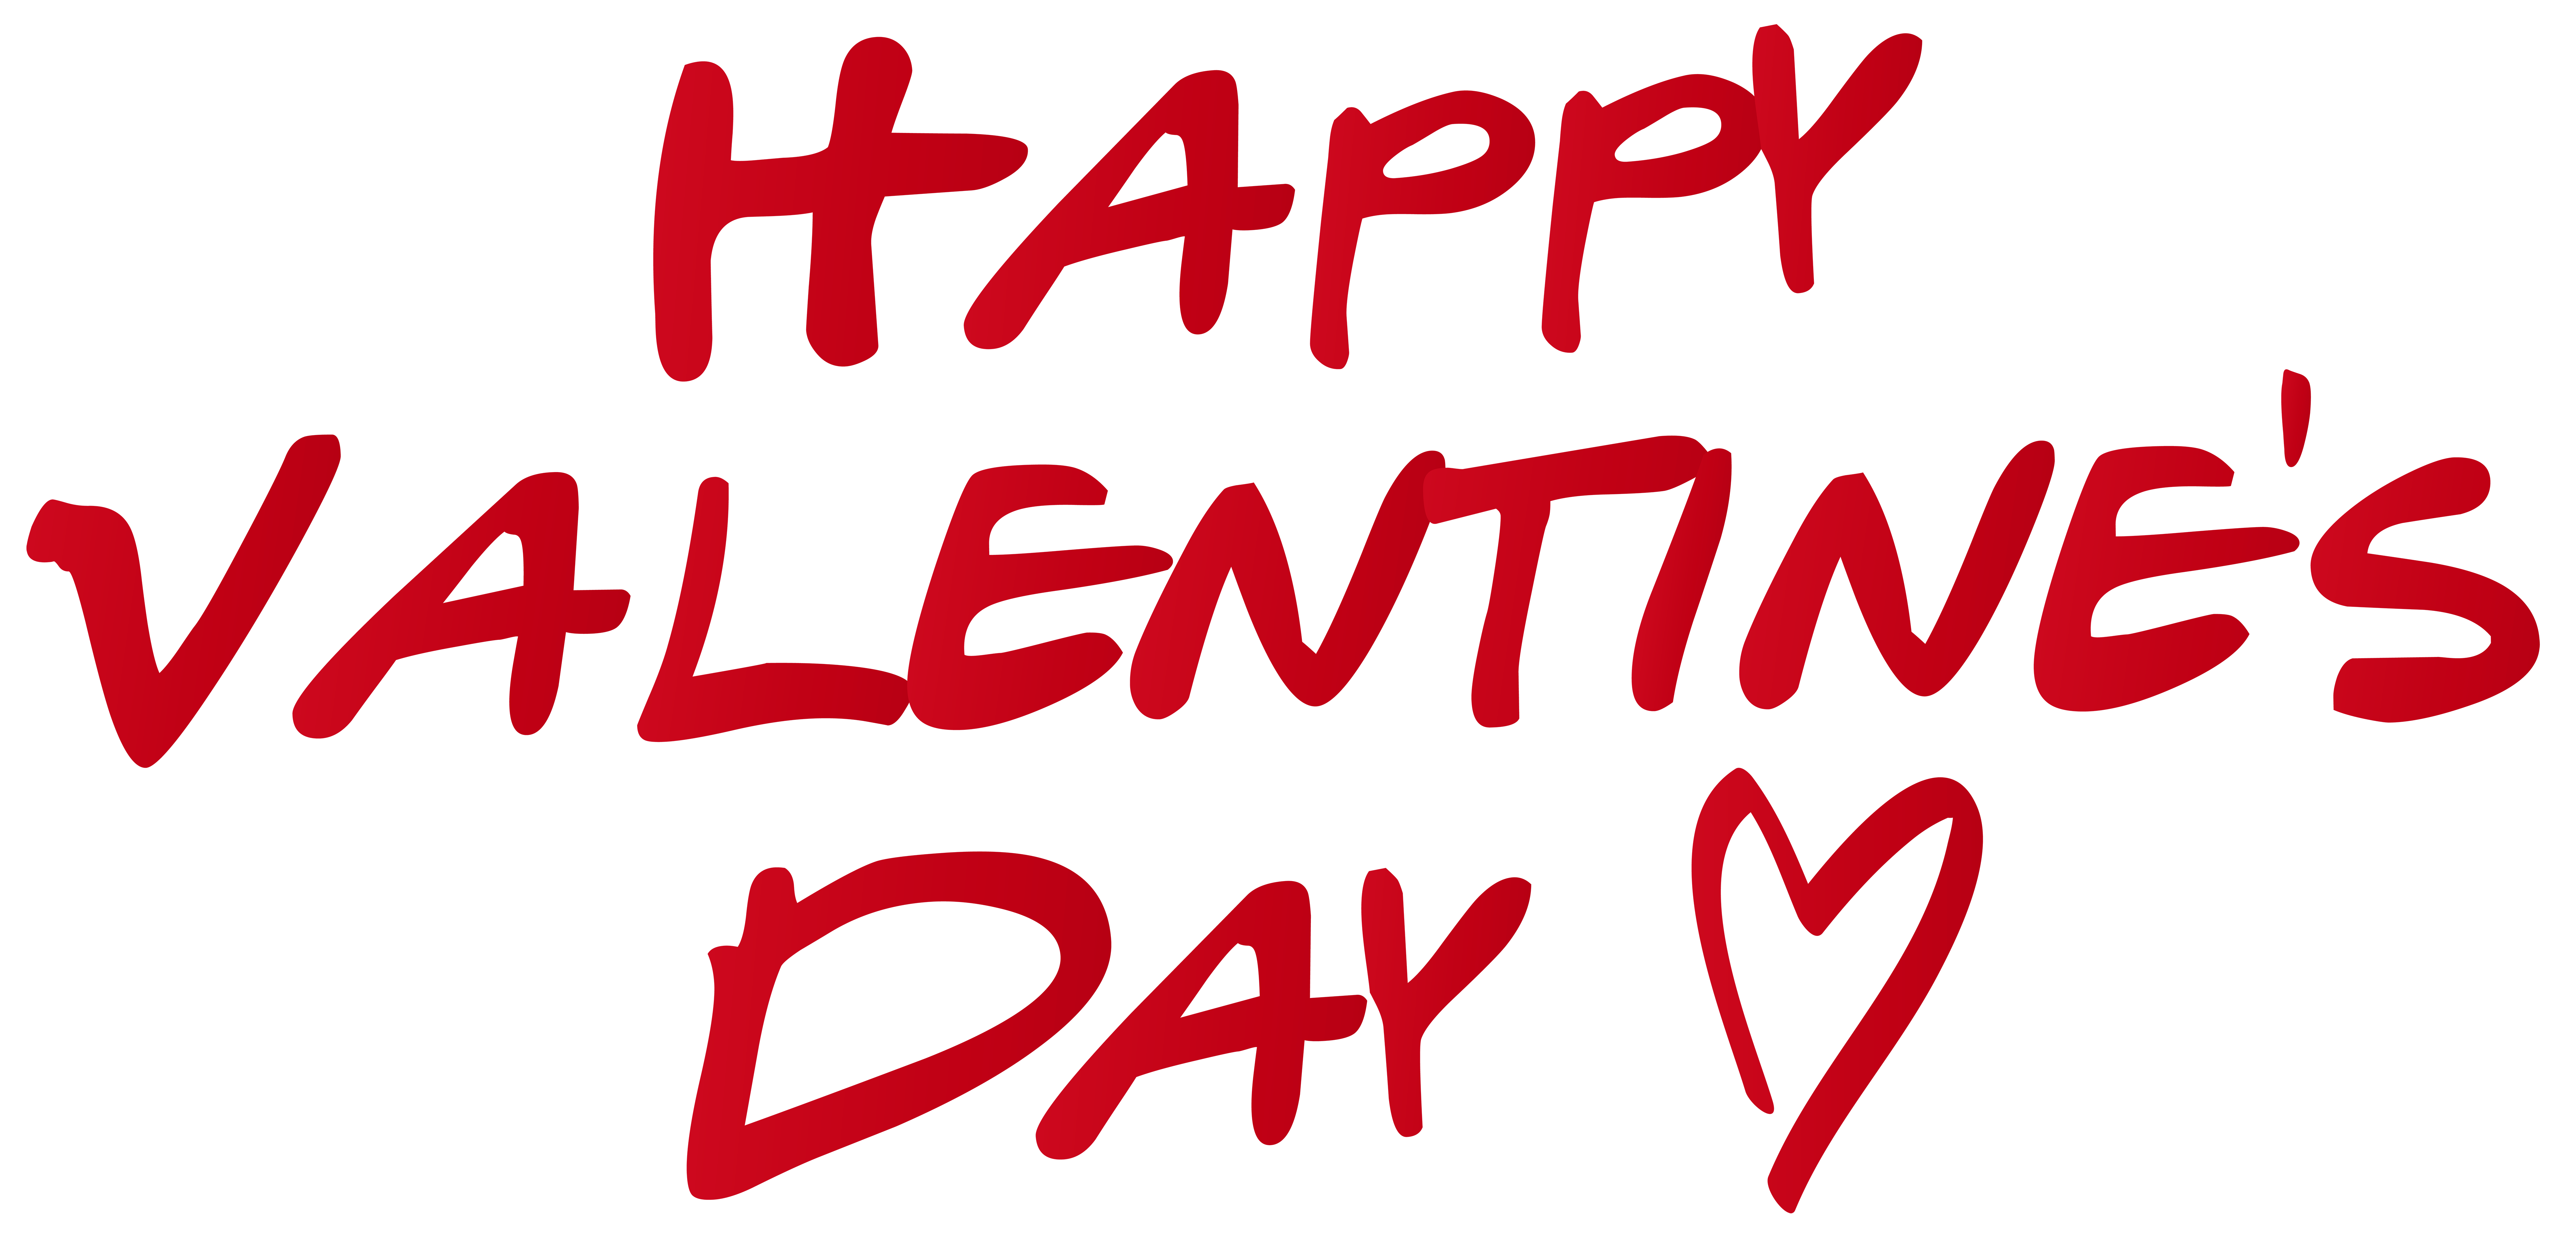 Dinosaur clipart valentines day. Free clip art download